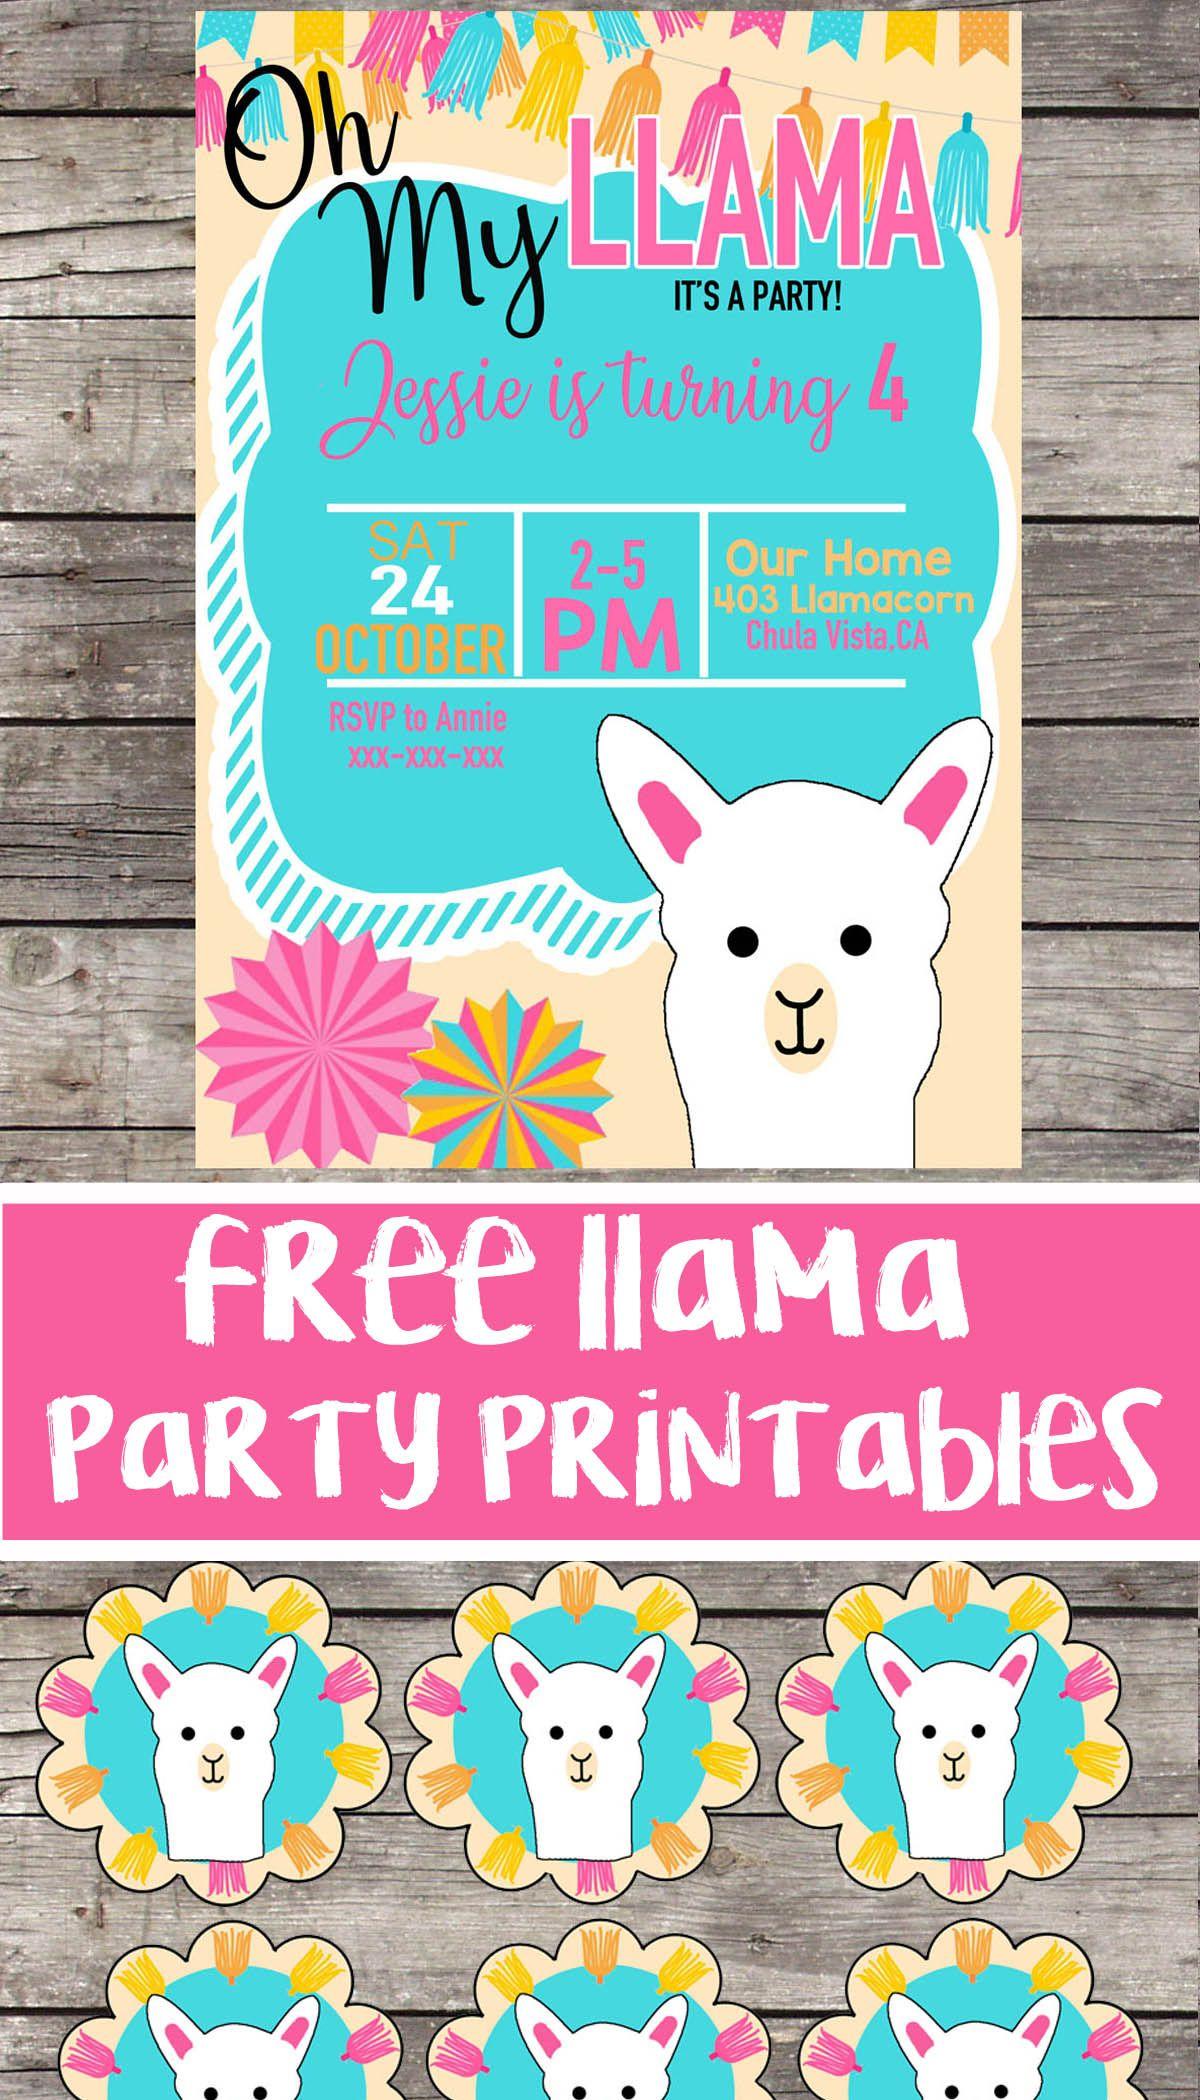 Free Llama Birthday Party Printable Files | Invitation | Cupcake - Free Stork Party Invitations Printable